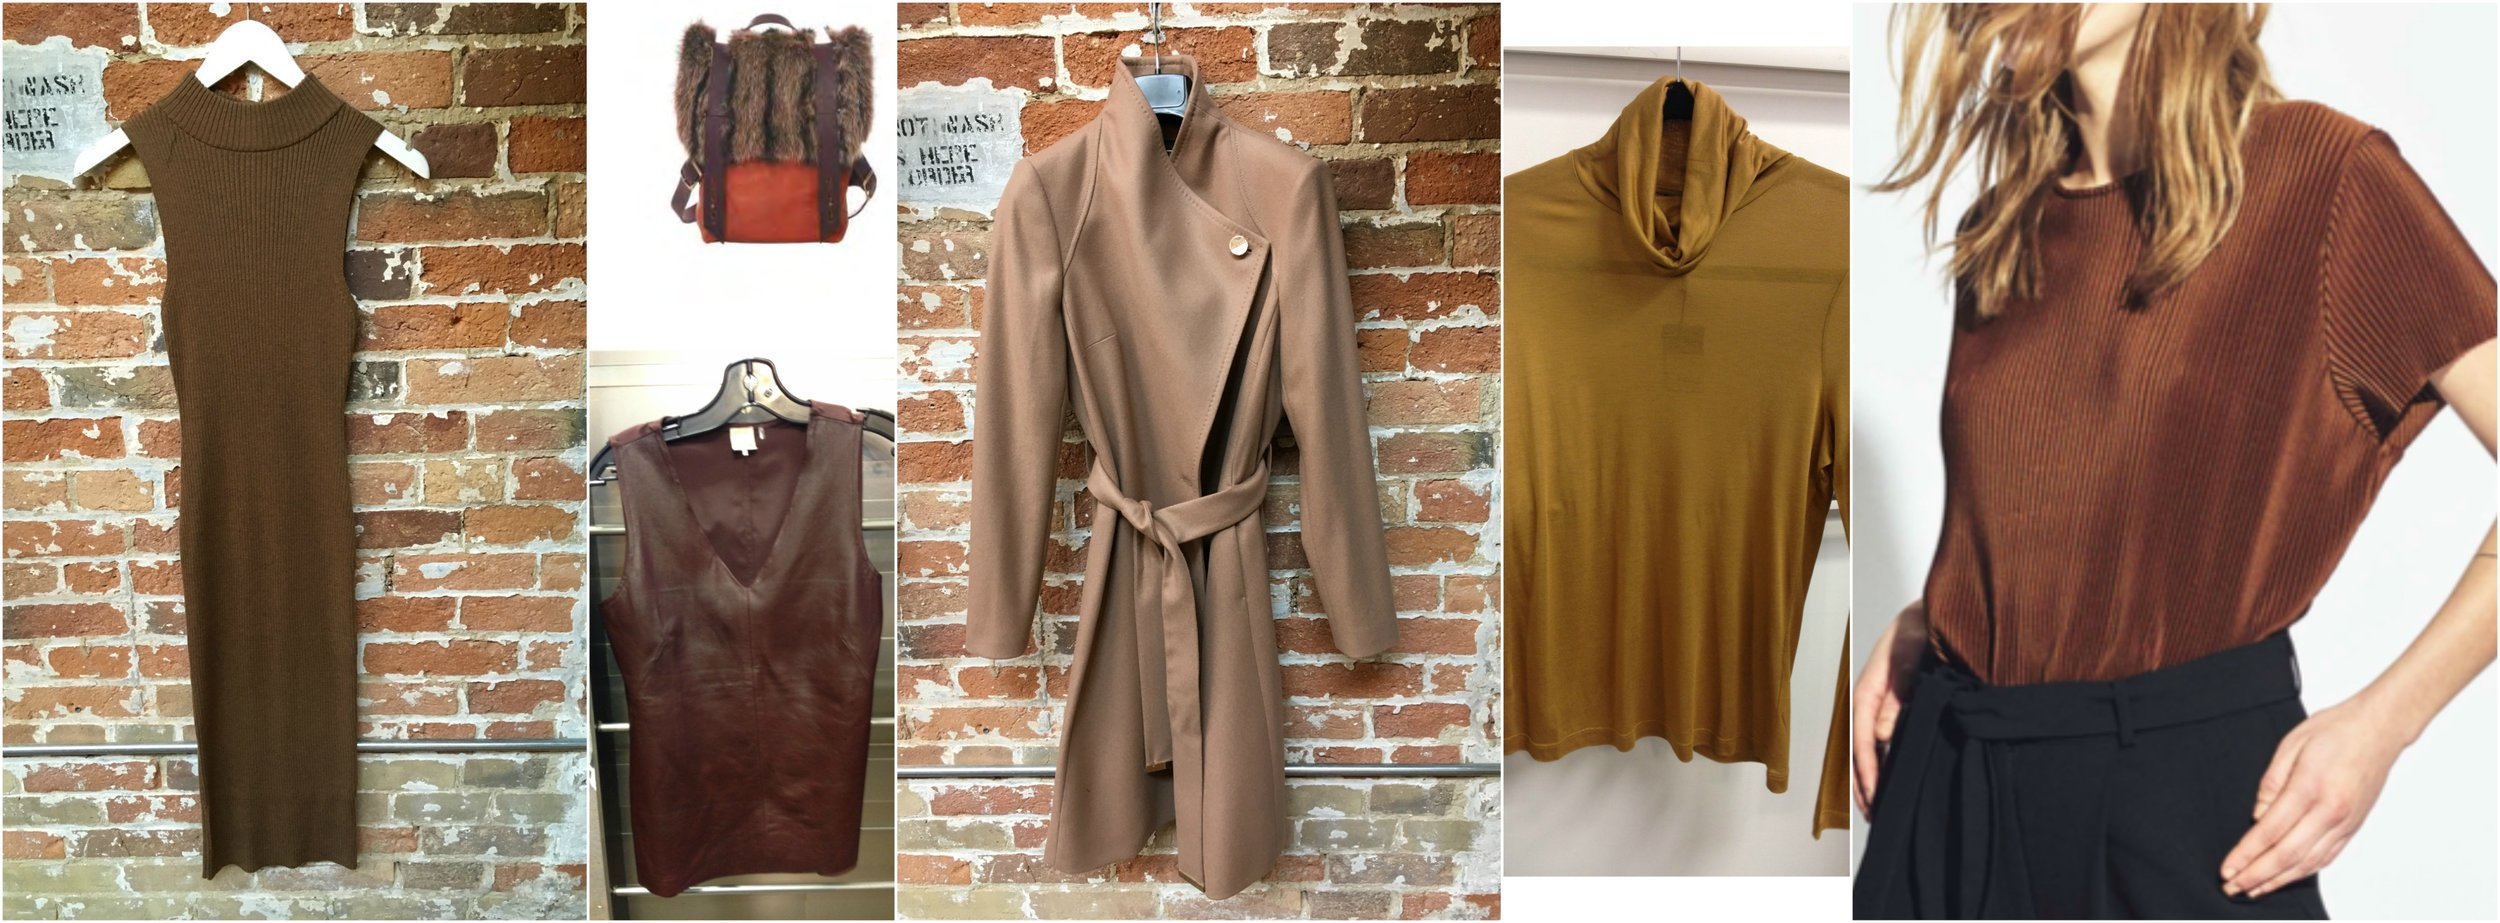 John & Jenn knit dress, Lowell leather & fur backpack, Ecru leather tank, Ted Baker wool coat, Fine Collection Turtleneck (coming soon), Just Female metallic Tee.